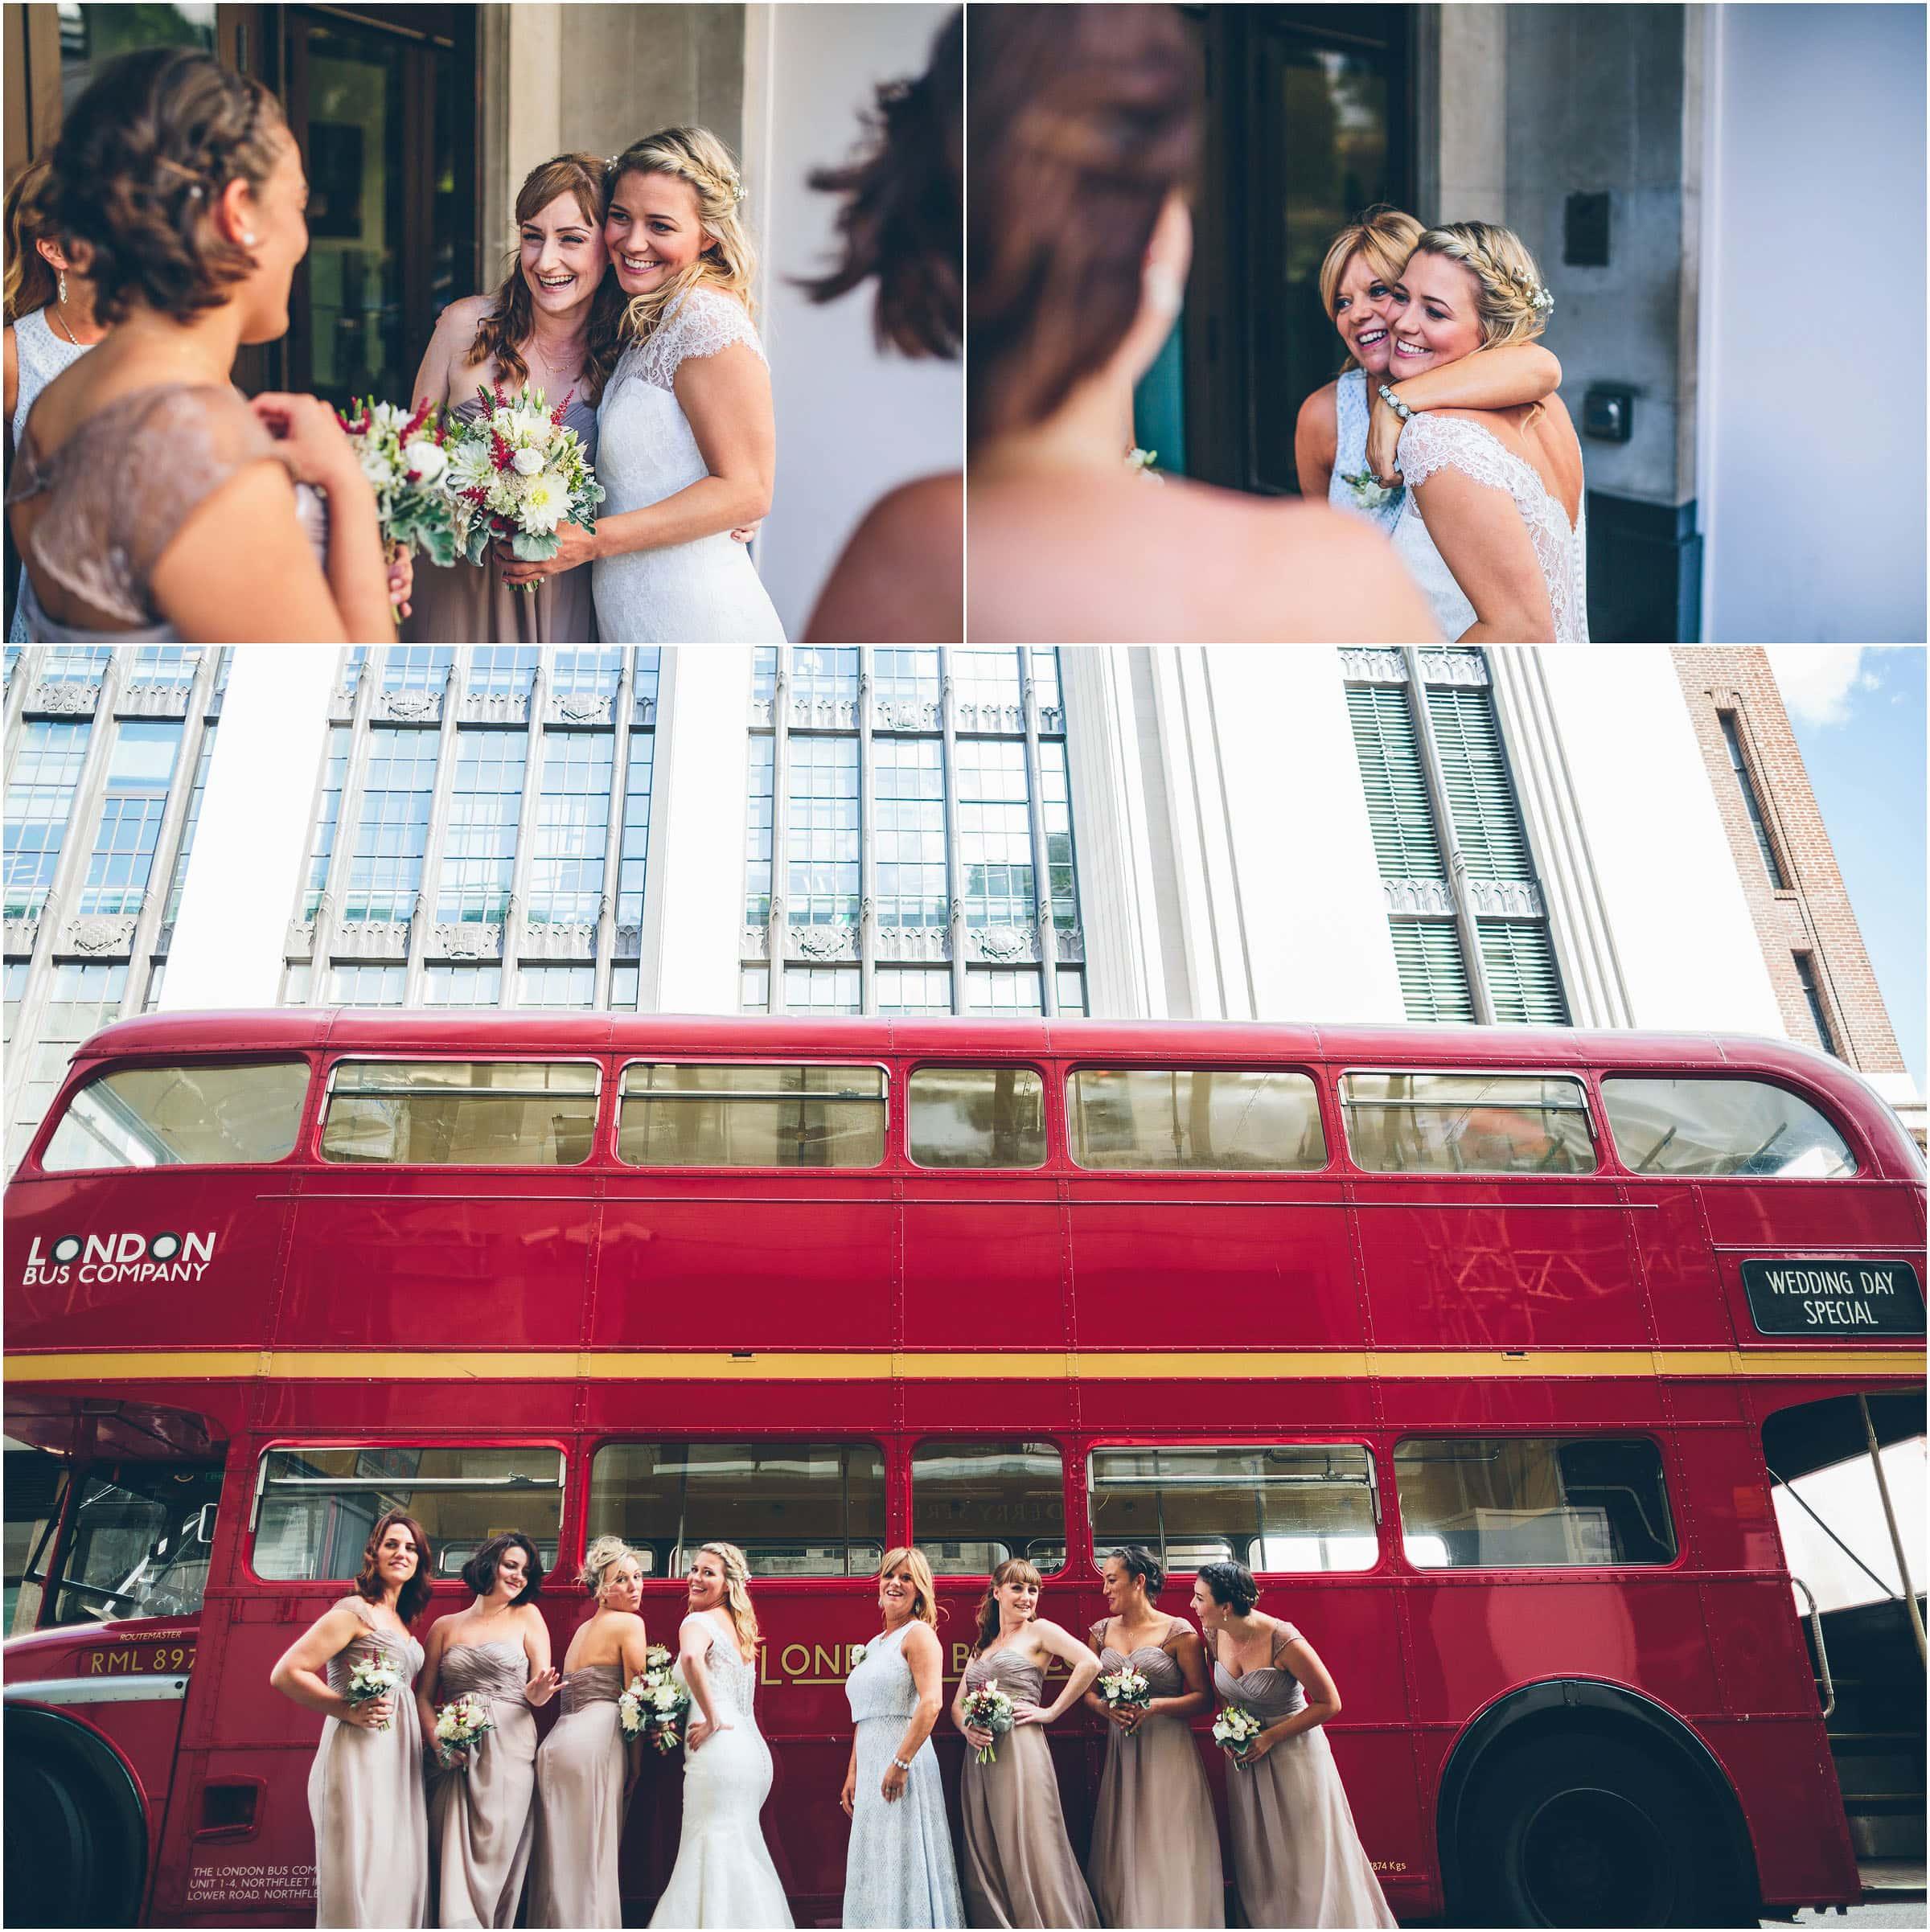 Kensington_Roof_Gardens_Wedding_Photography_0023